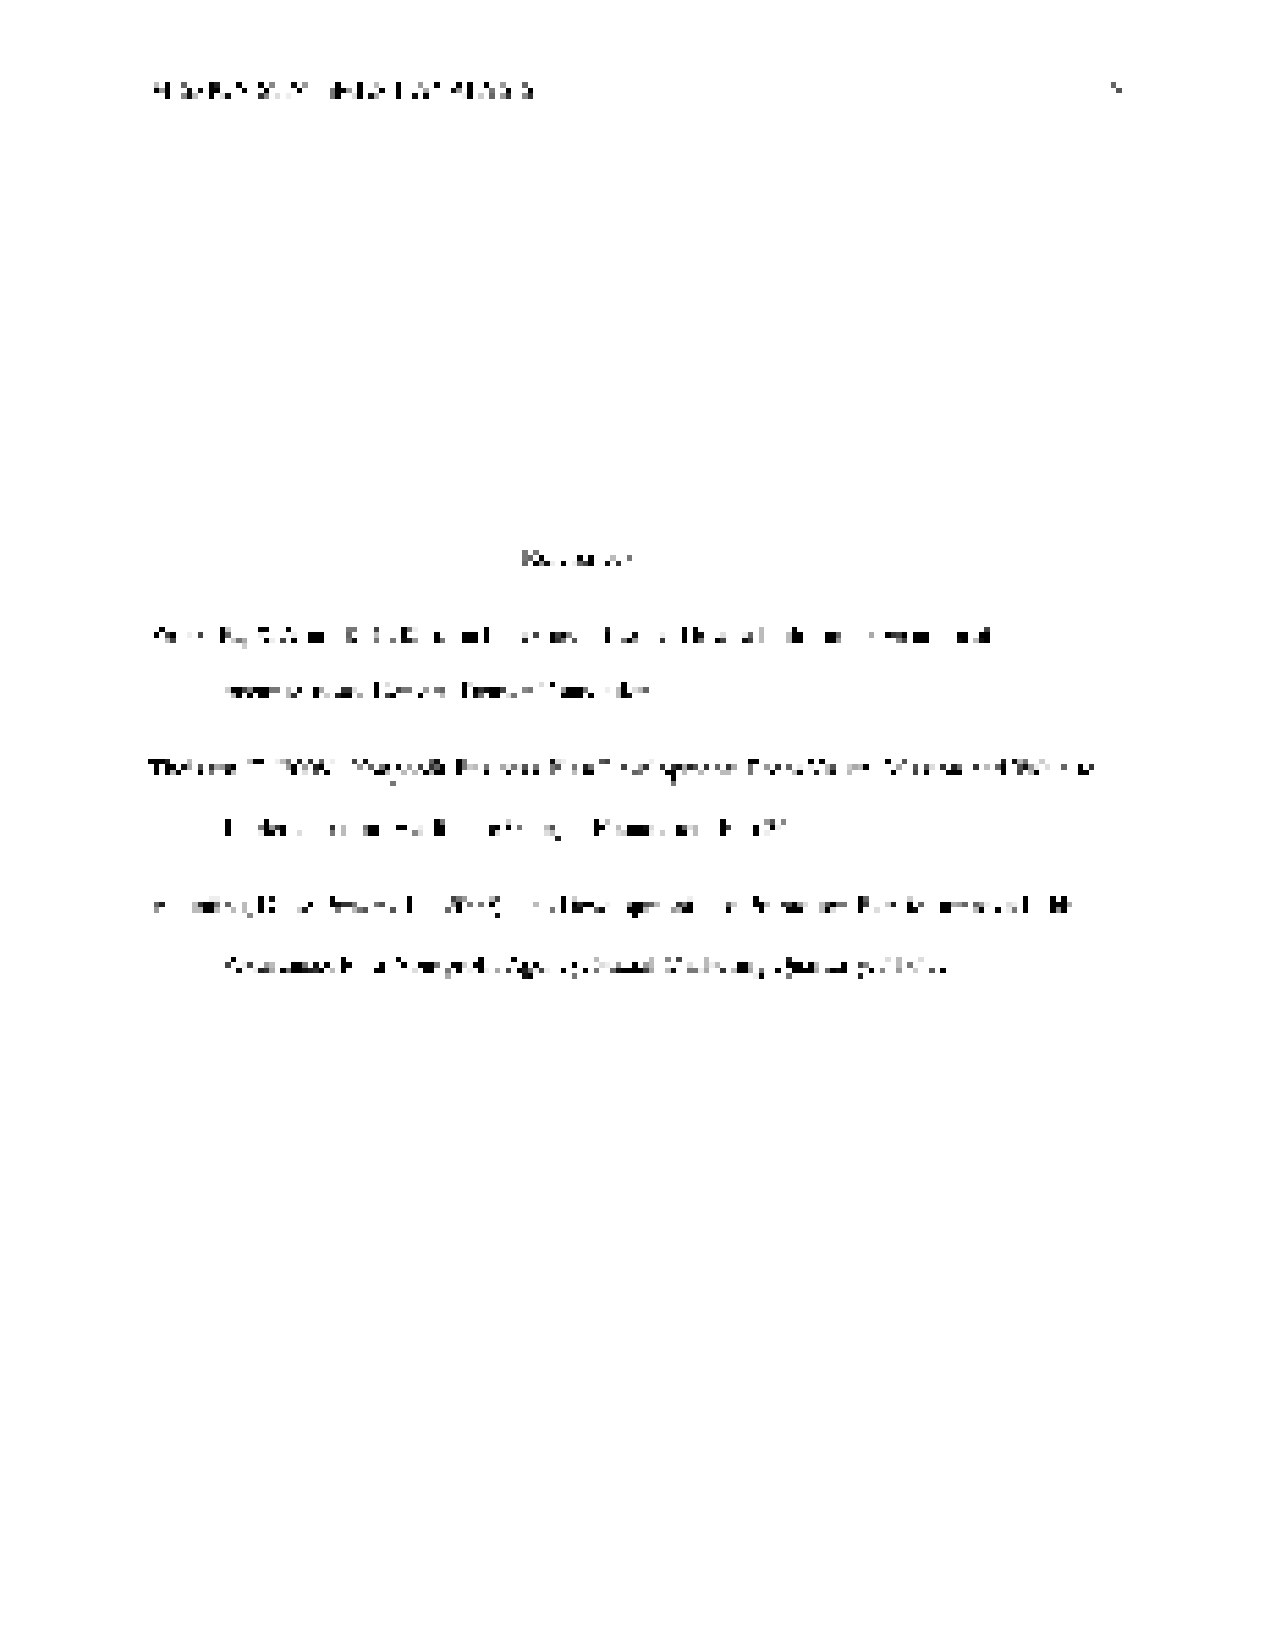 mission statement format